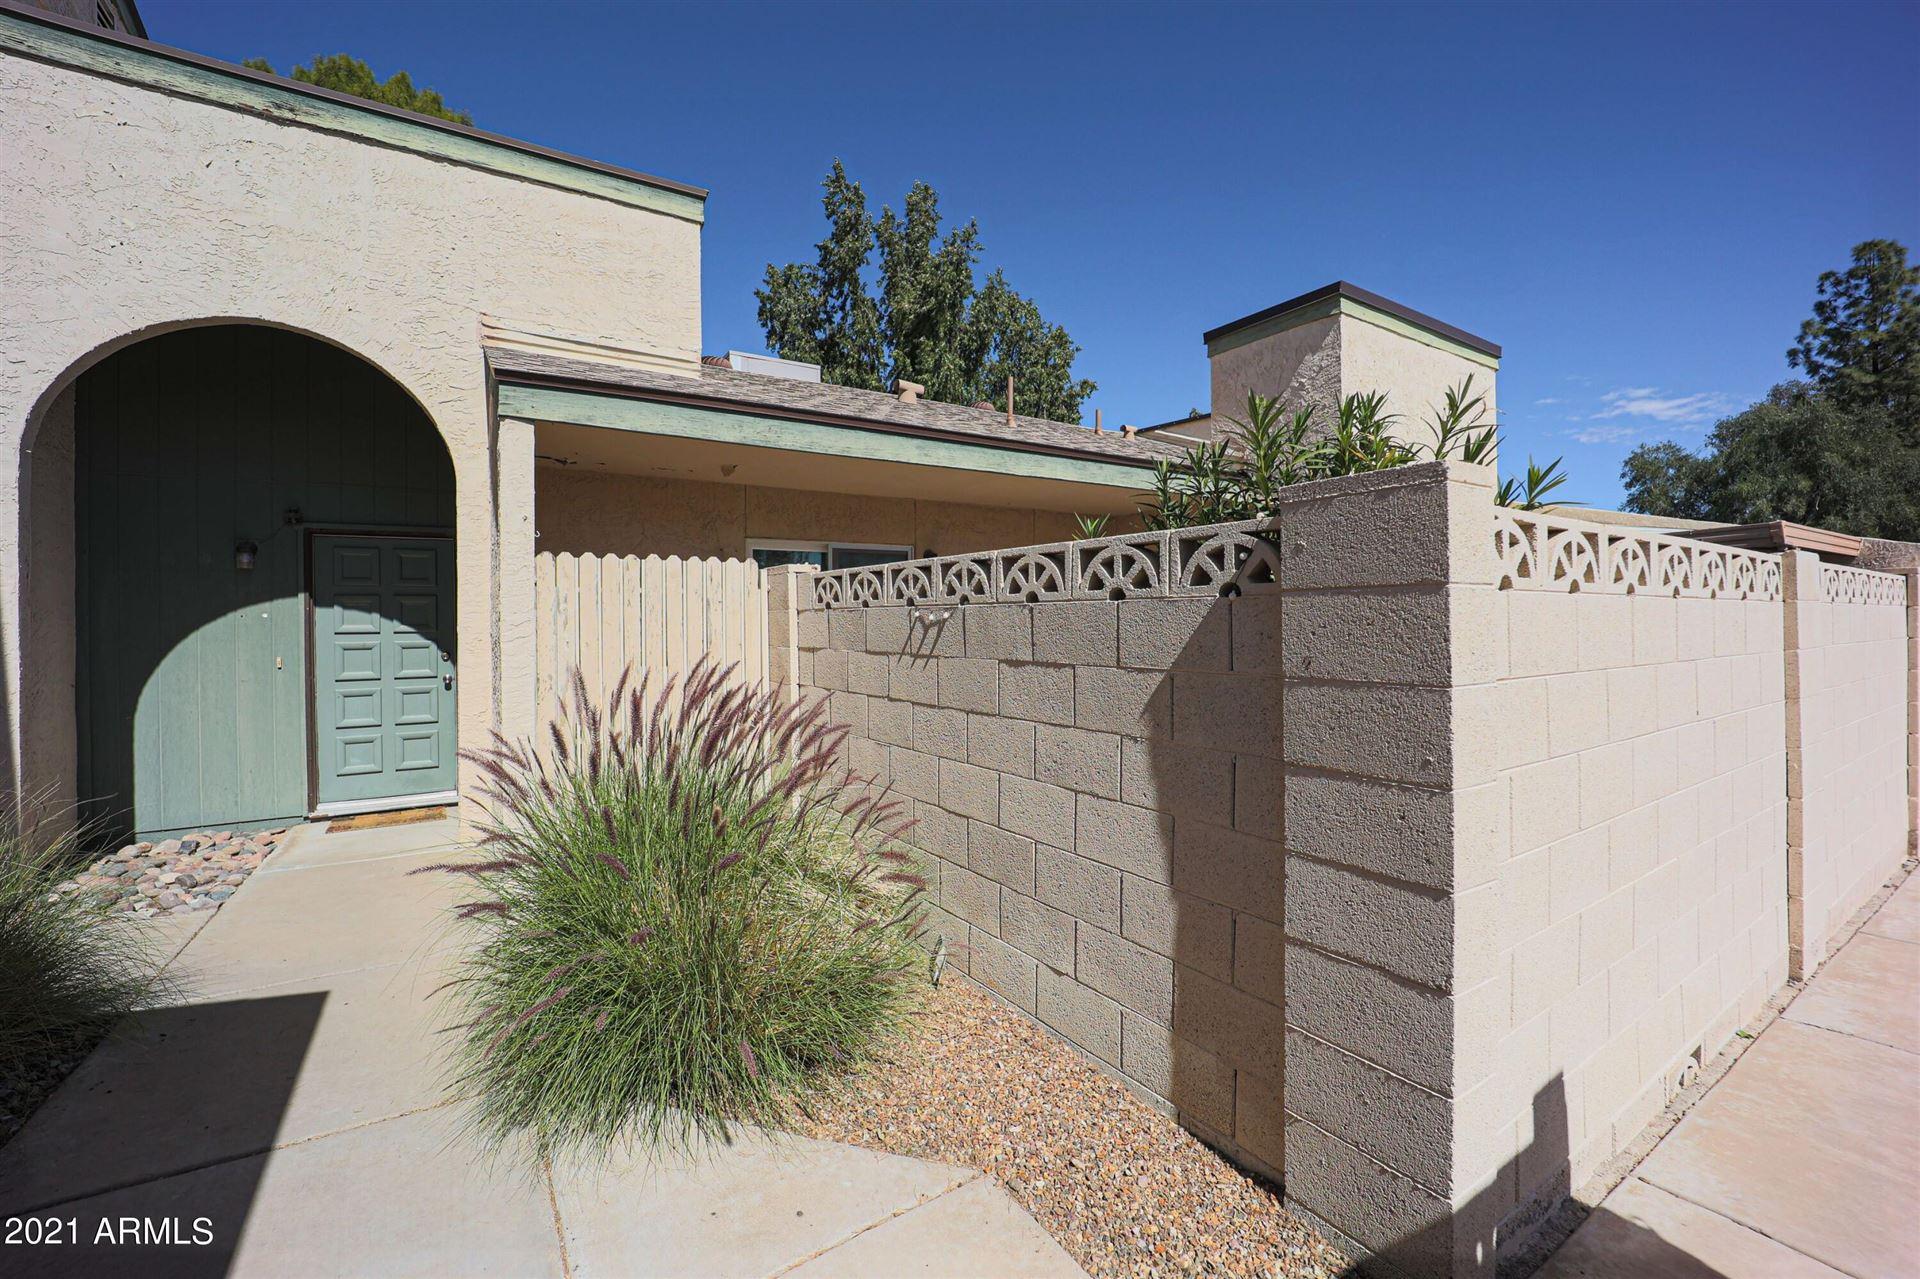 4721 W CONTINENTAL Drive, Glendale, AZ 85308 - MLS#: 6202825